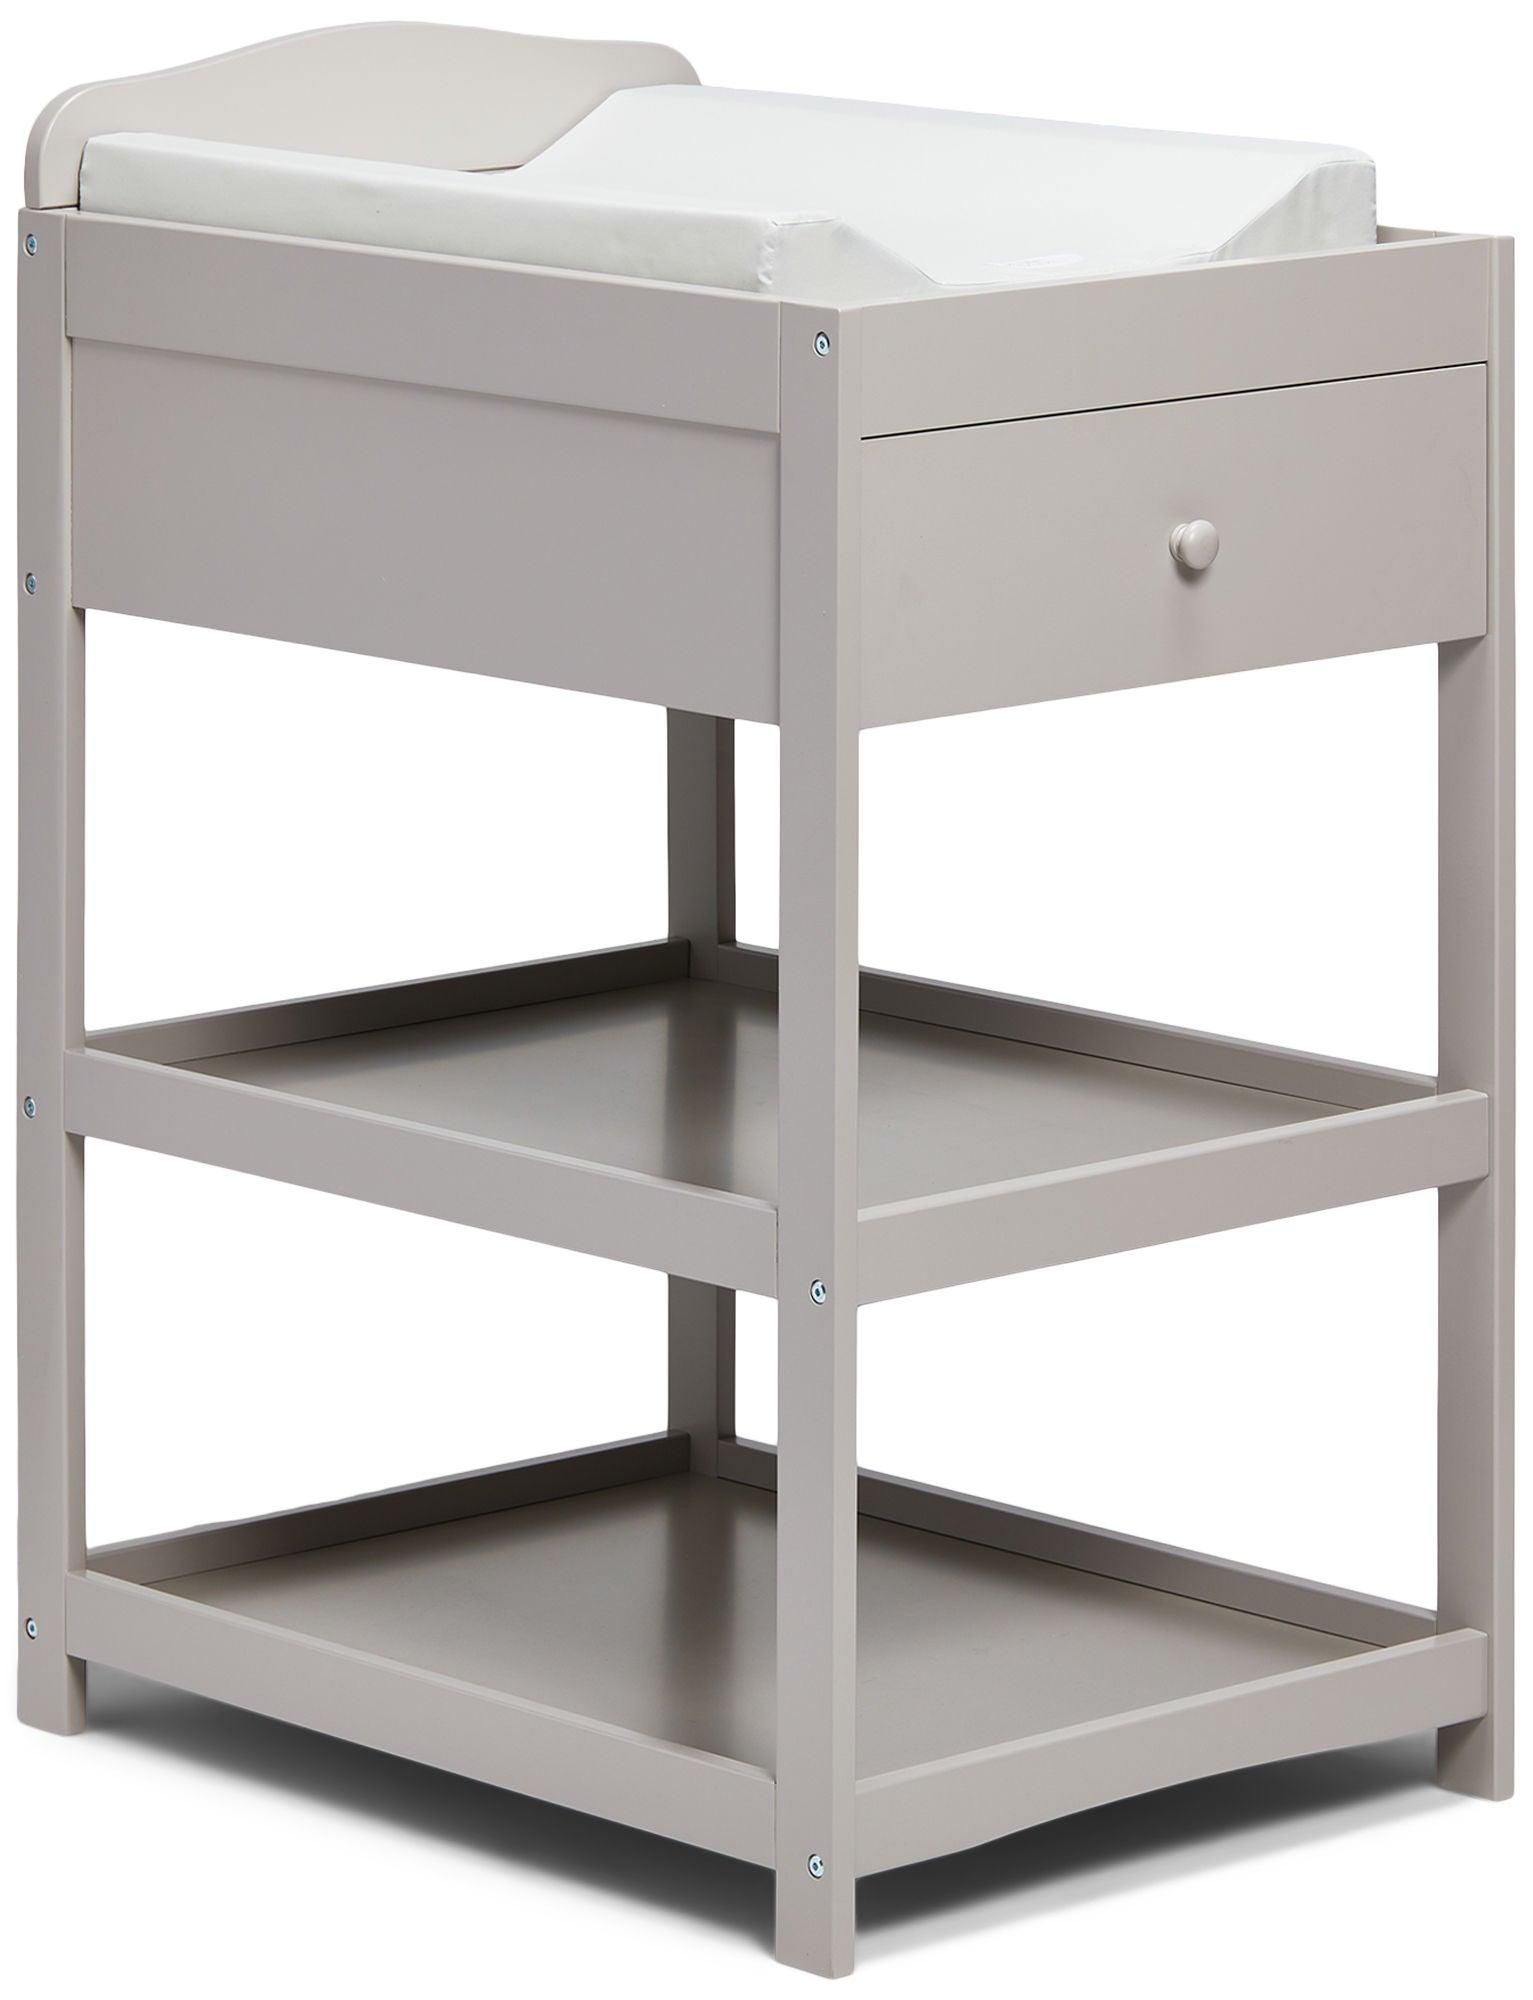 JLY Dream Lux Hoitopöytä, Warm Grey